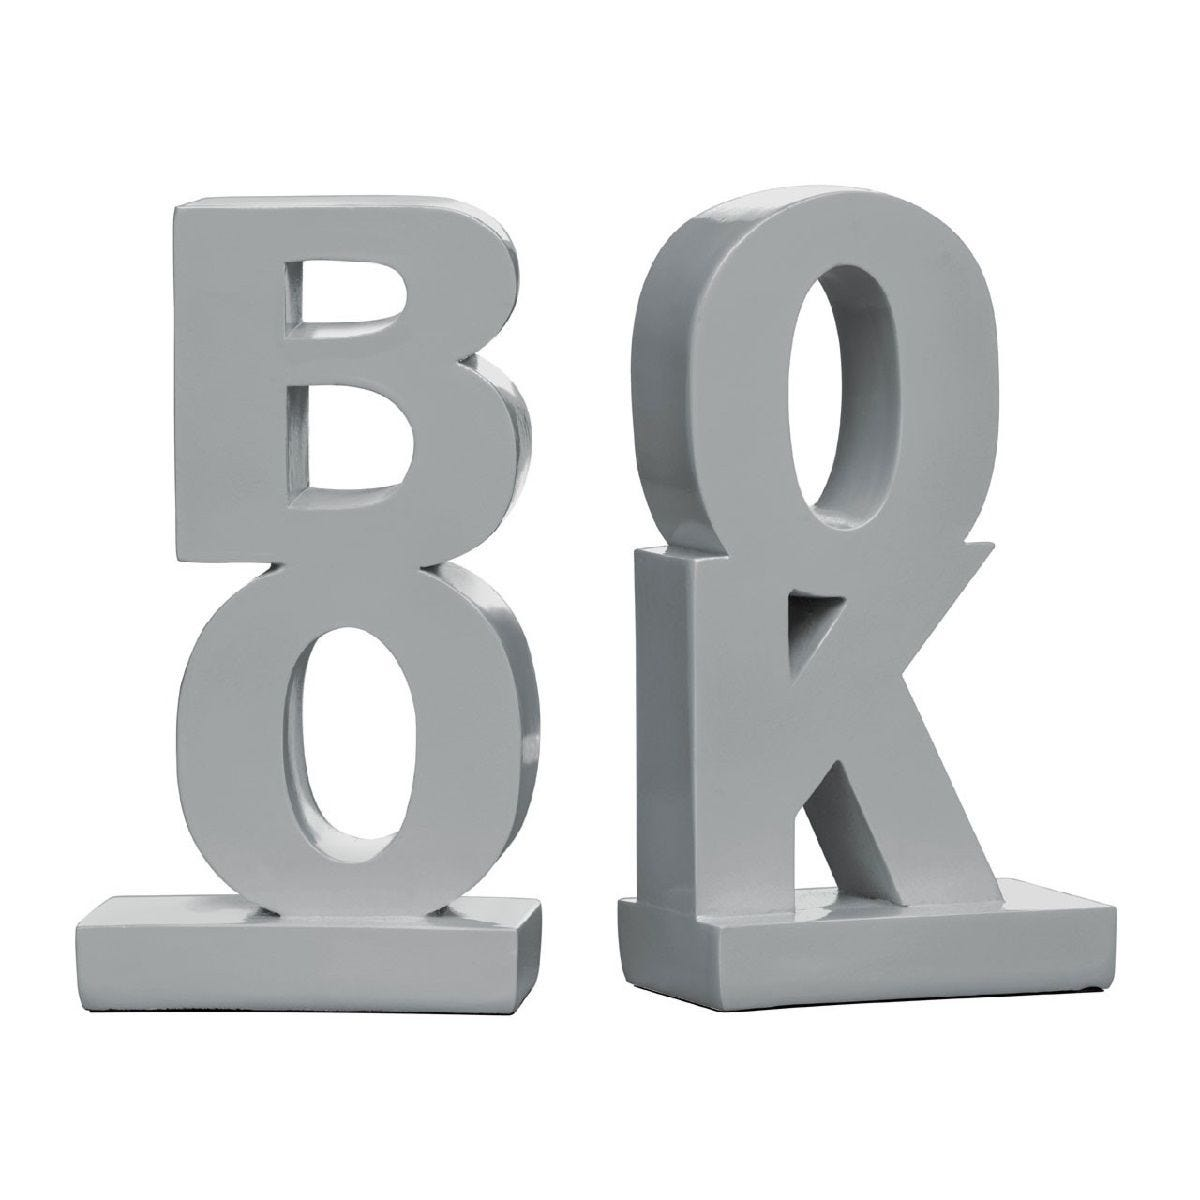 Premier Housewares 'Book' Bookends Set of 2 - Polyresin Grey High Gloss